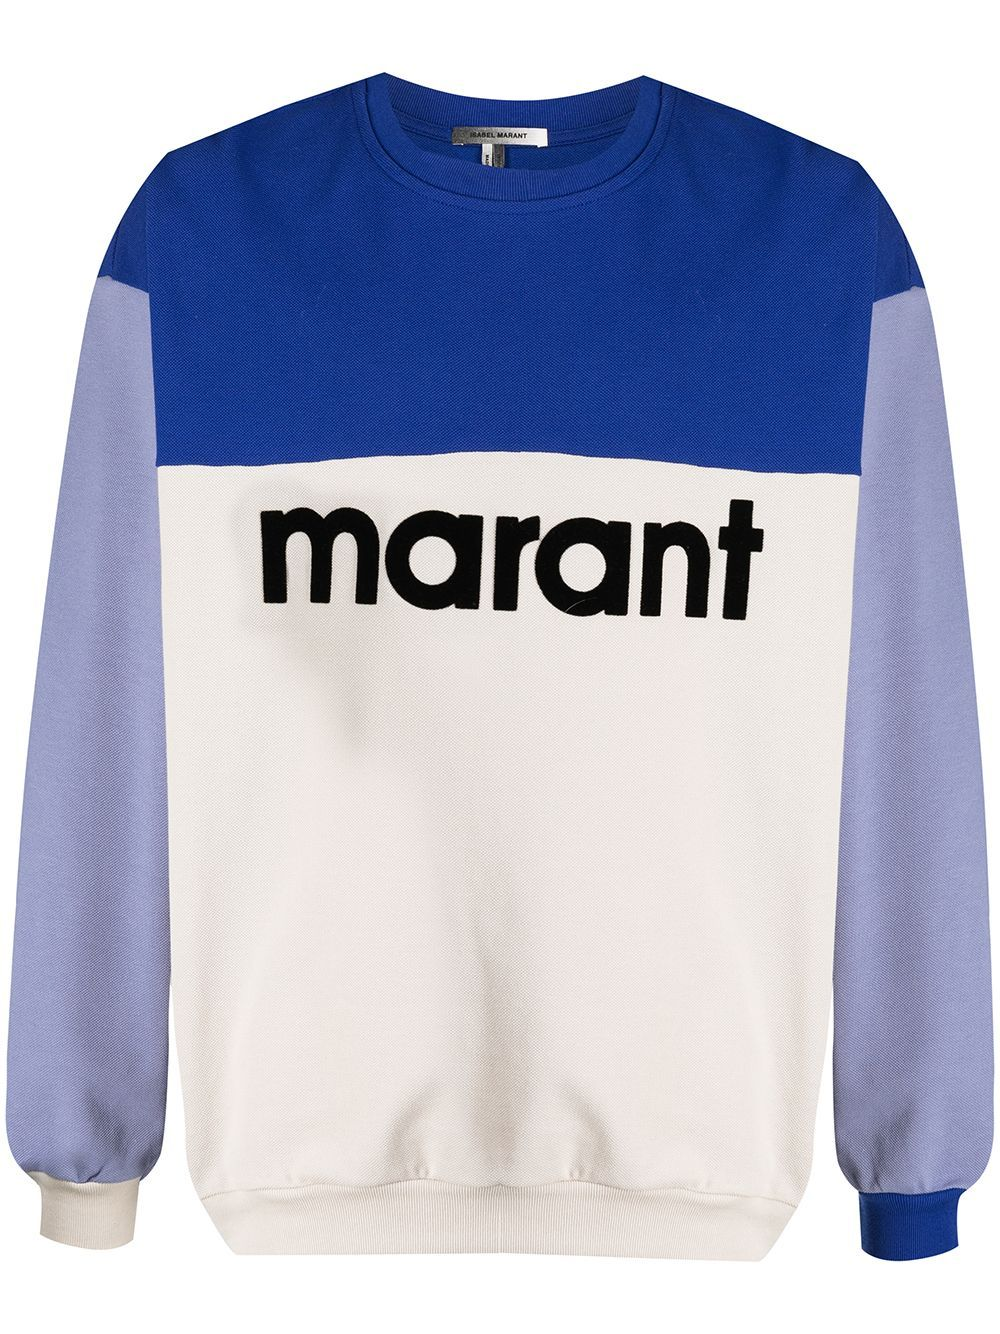 Isabel Marant felpa color-block uomo ISABEL MARANT | Felpe | SW0279-21P033H30BU